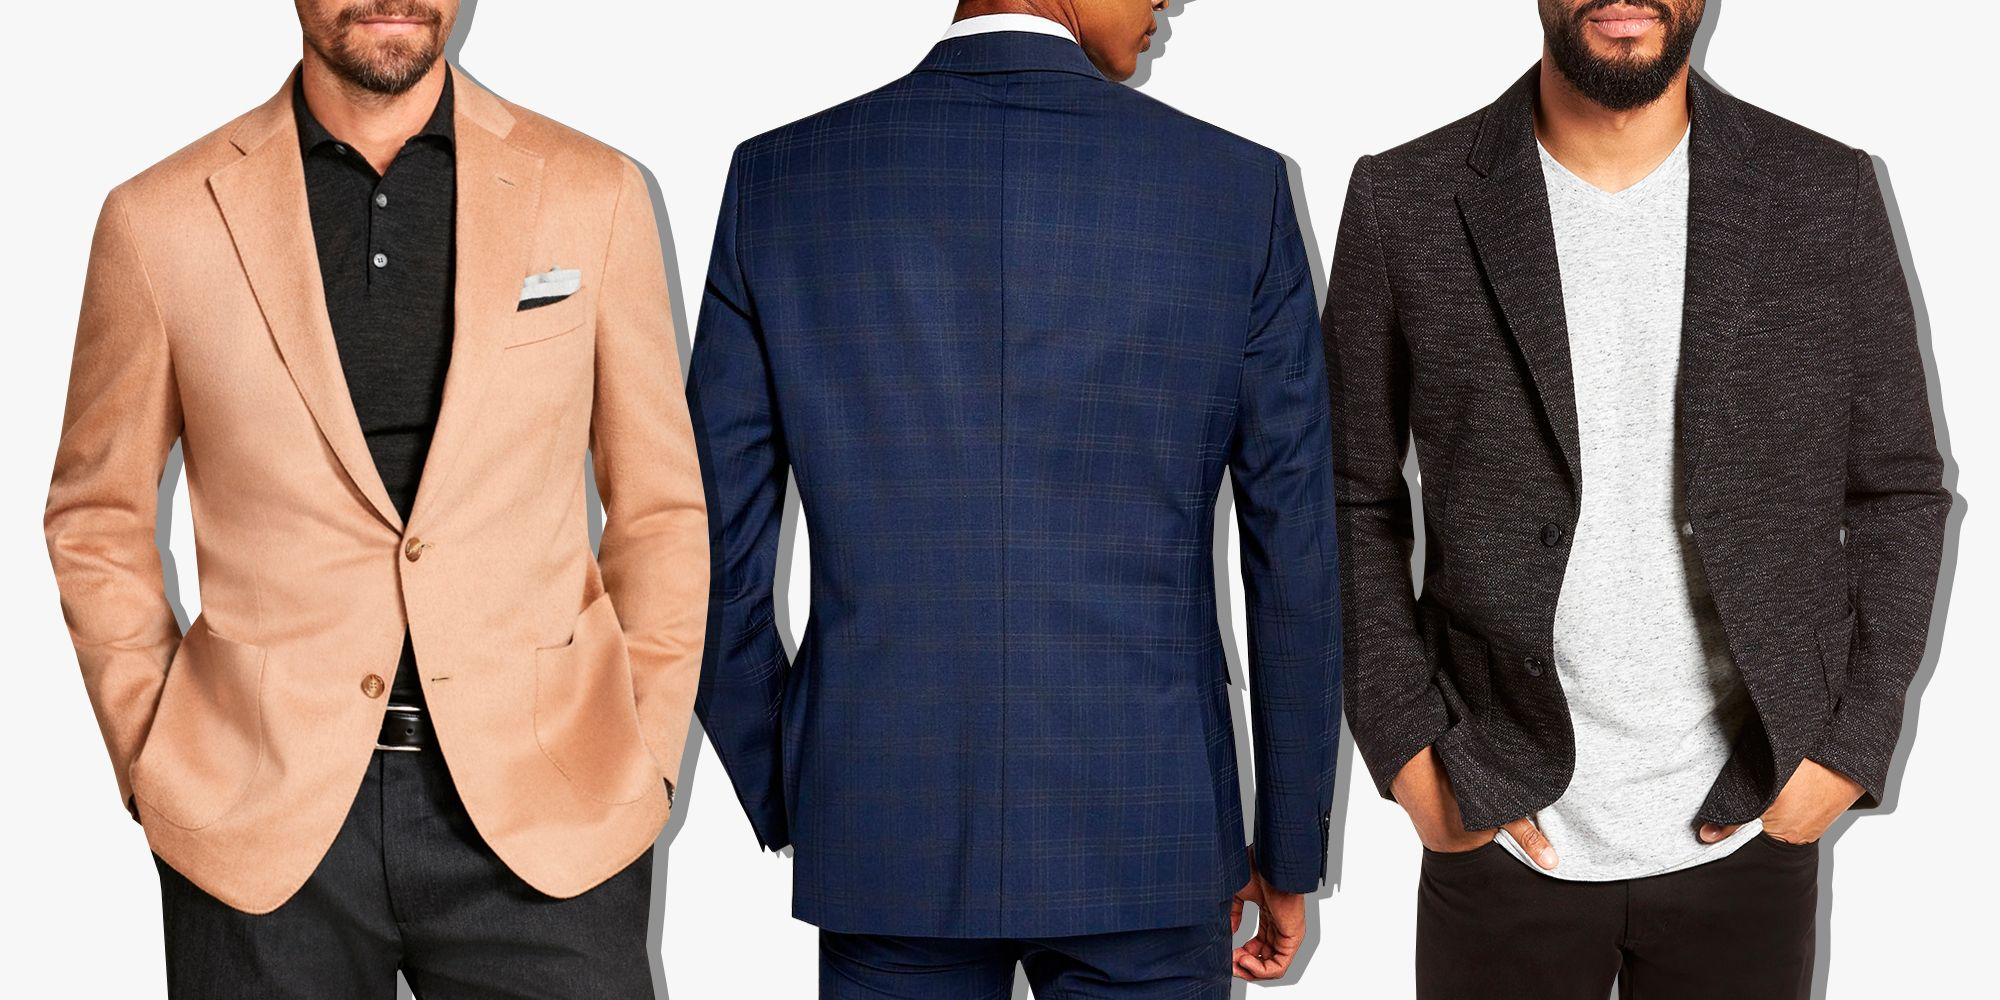 Mens Patterned Blazers Simple Design Ideas